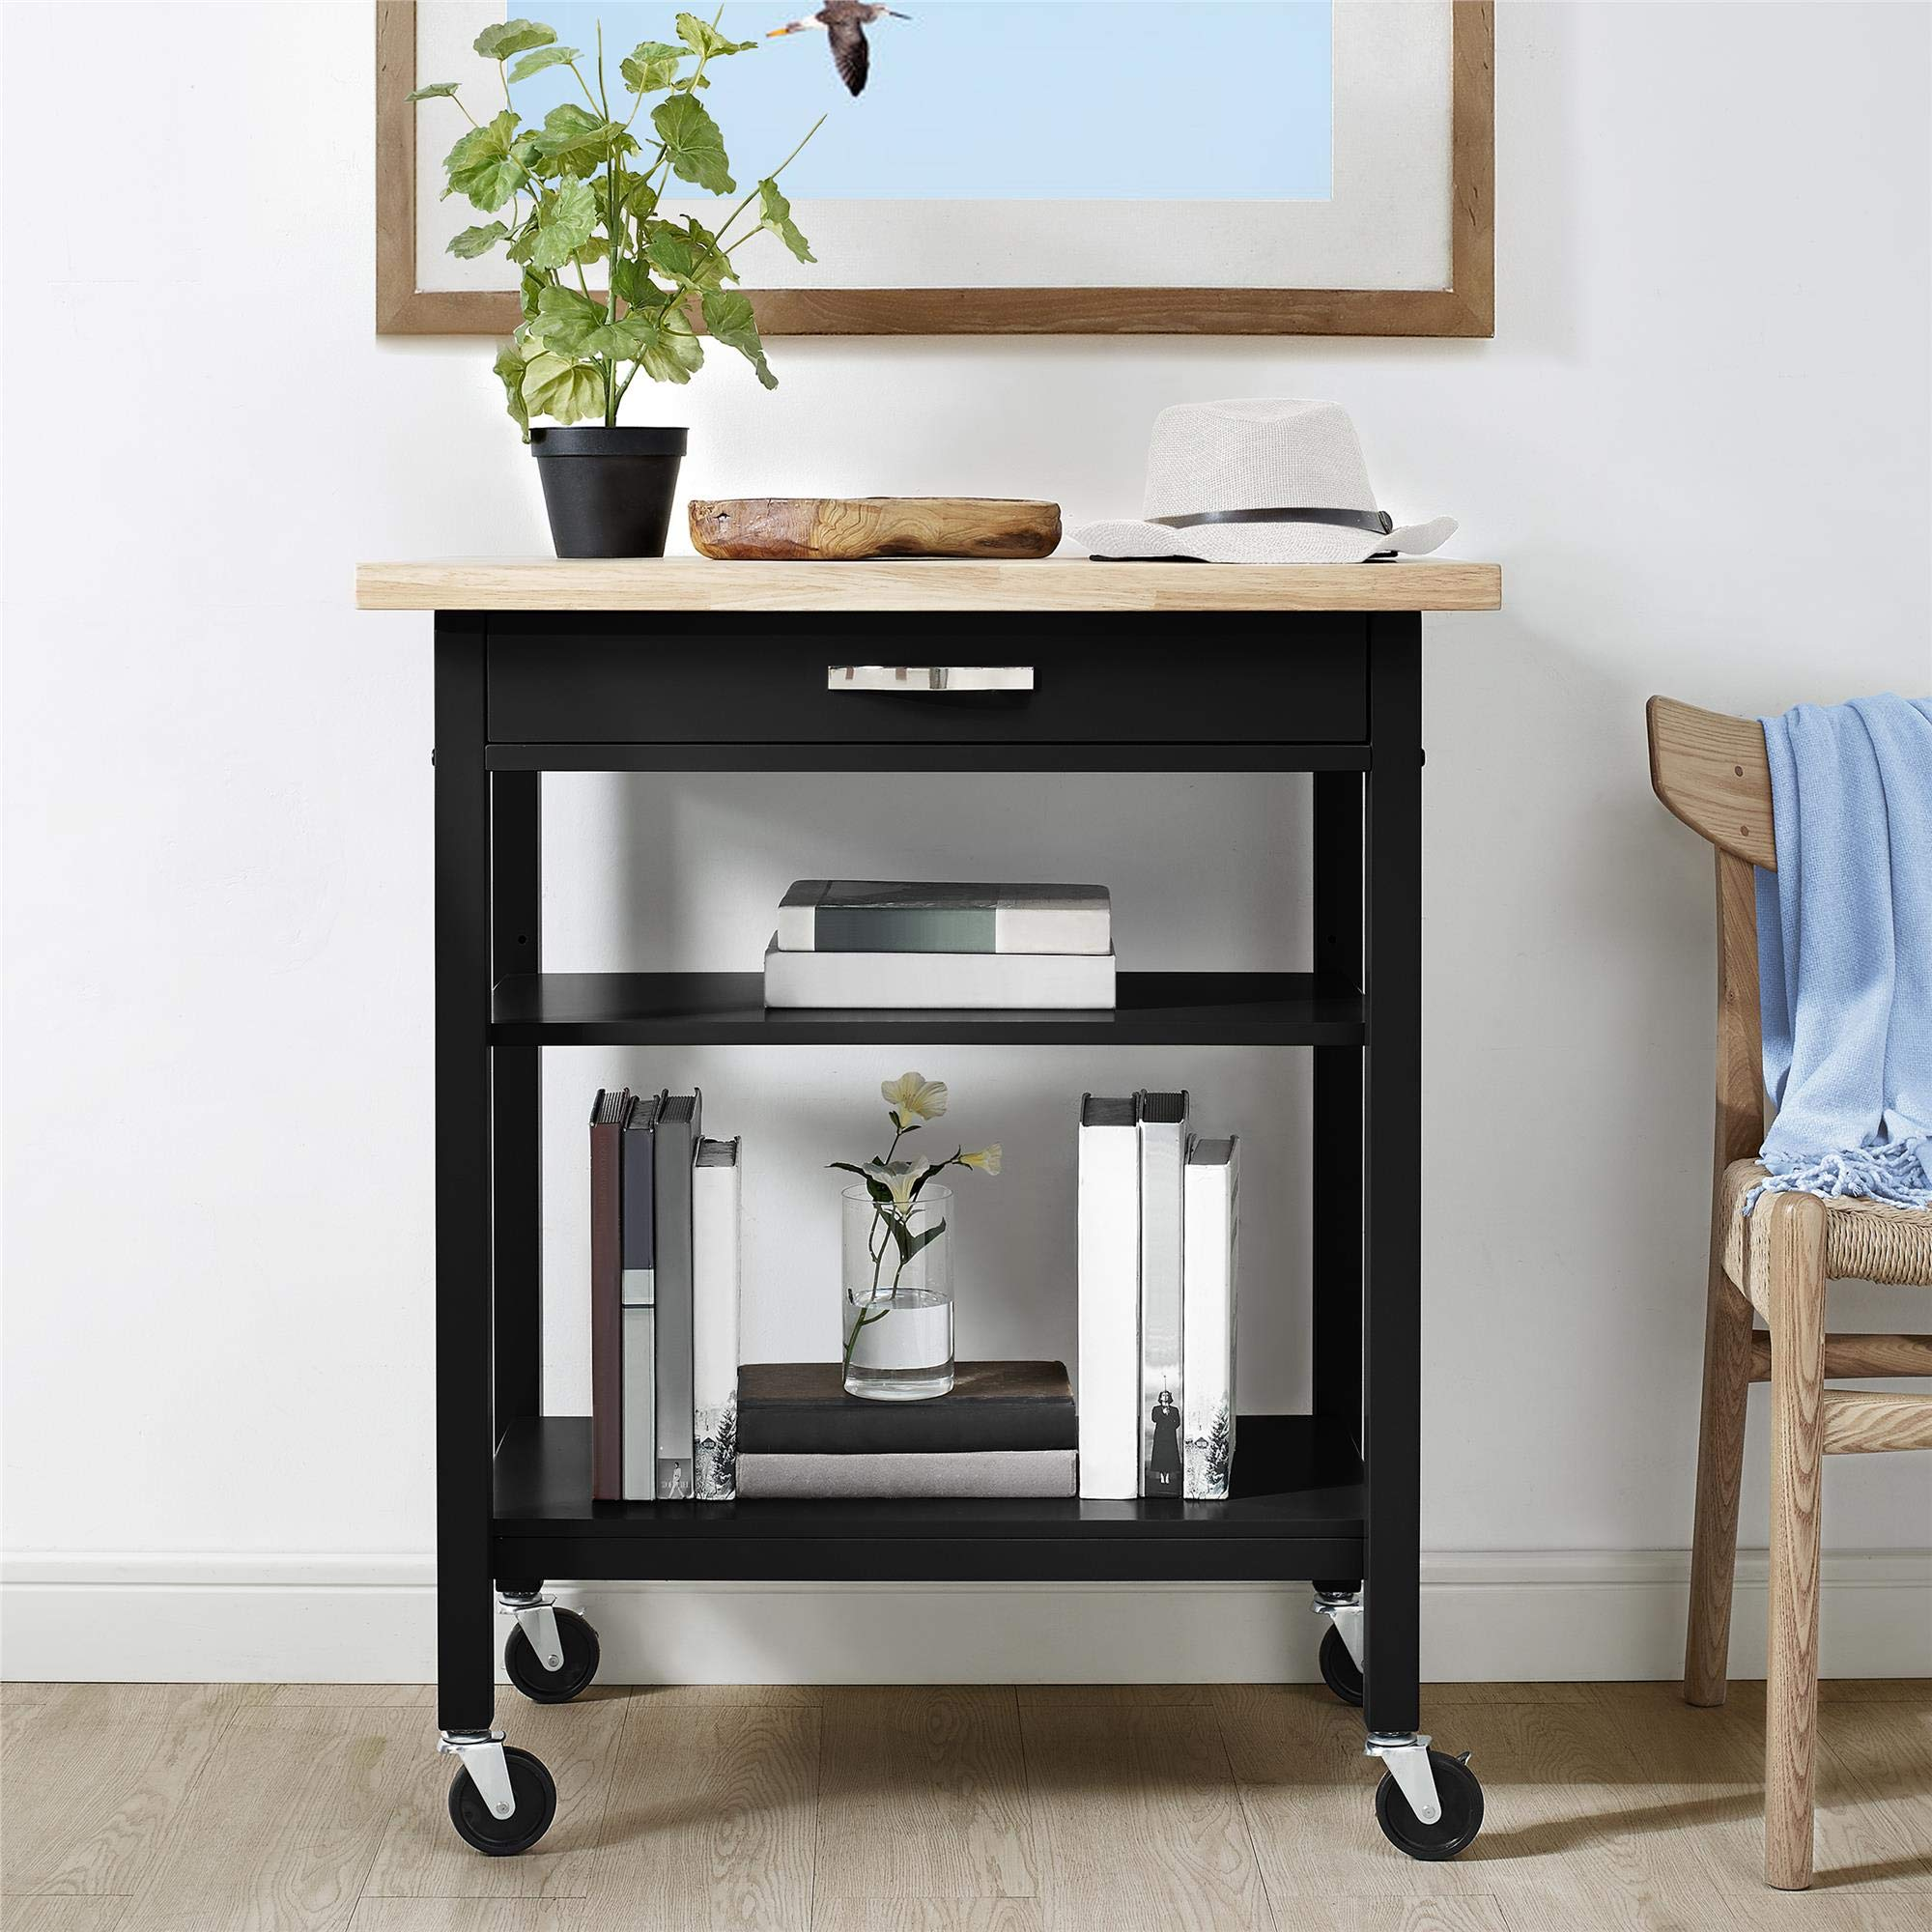 Dorel Living DL7618B Hogan Multifunction, Black Kitchen Carts,